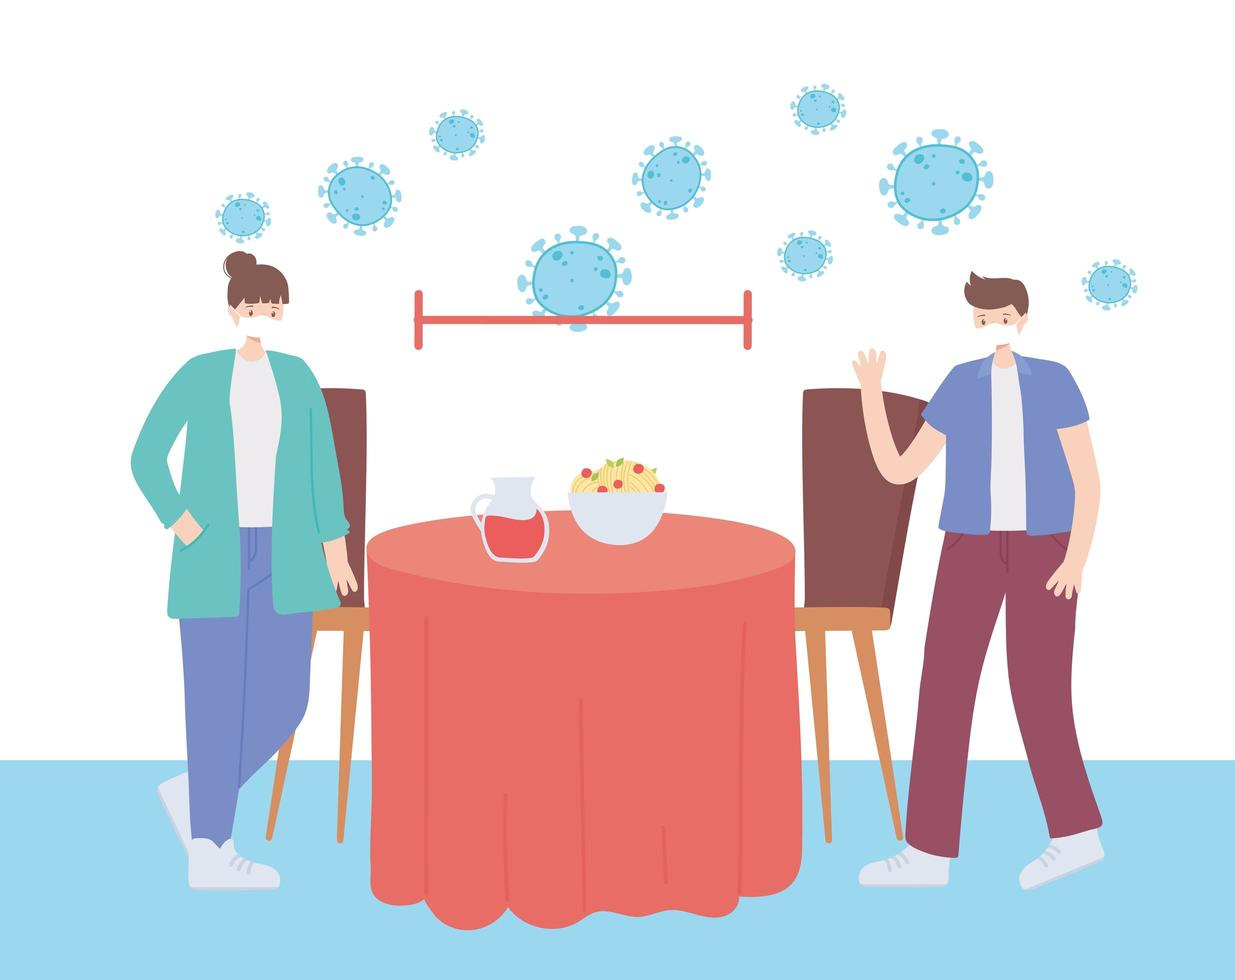 Restaurant on coronavirus prevention with social distancing vector